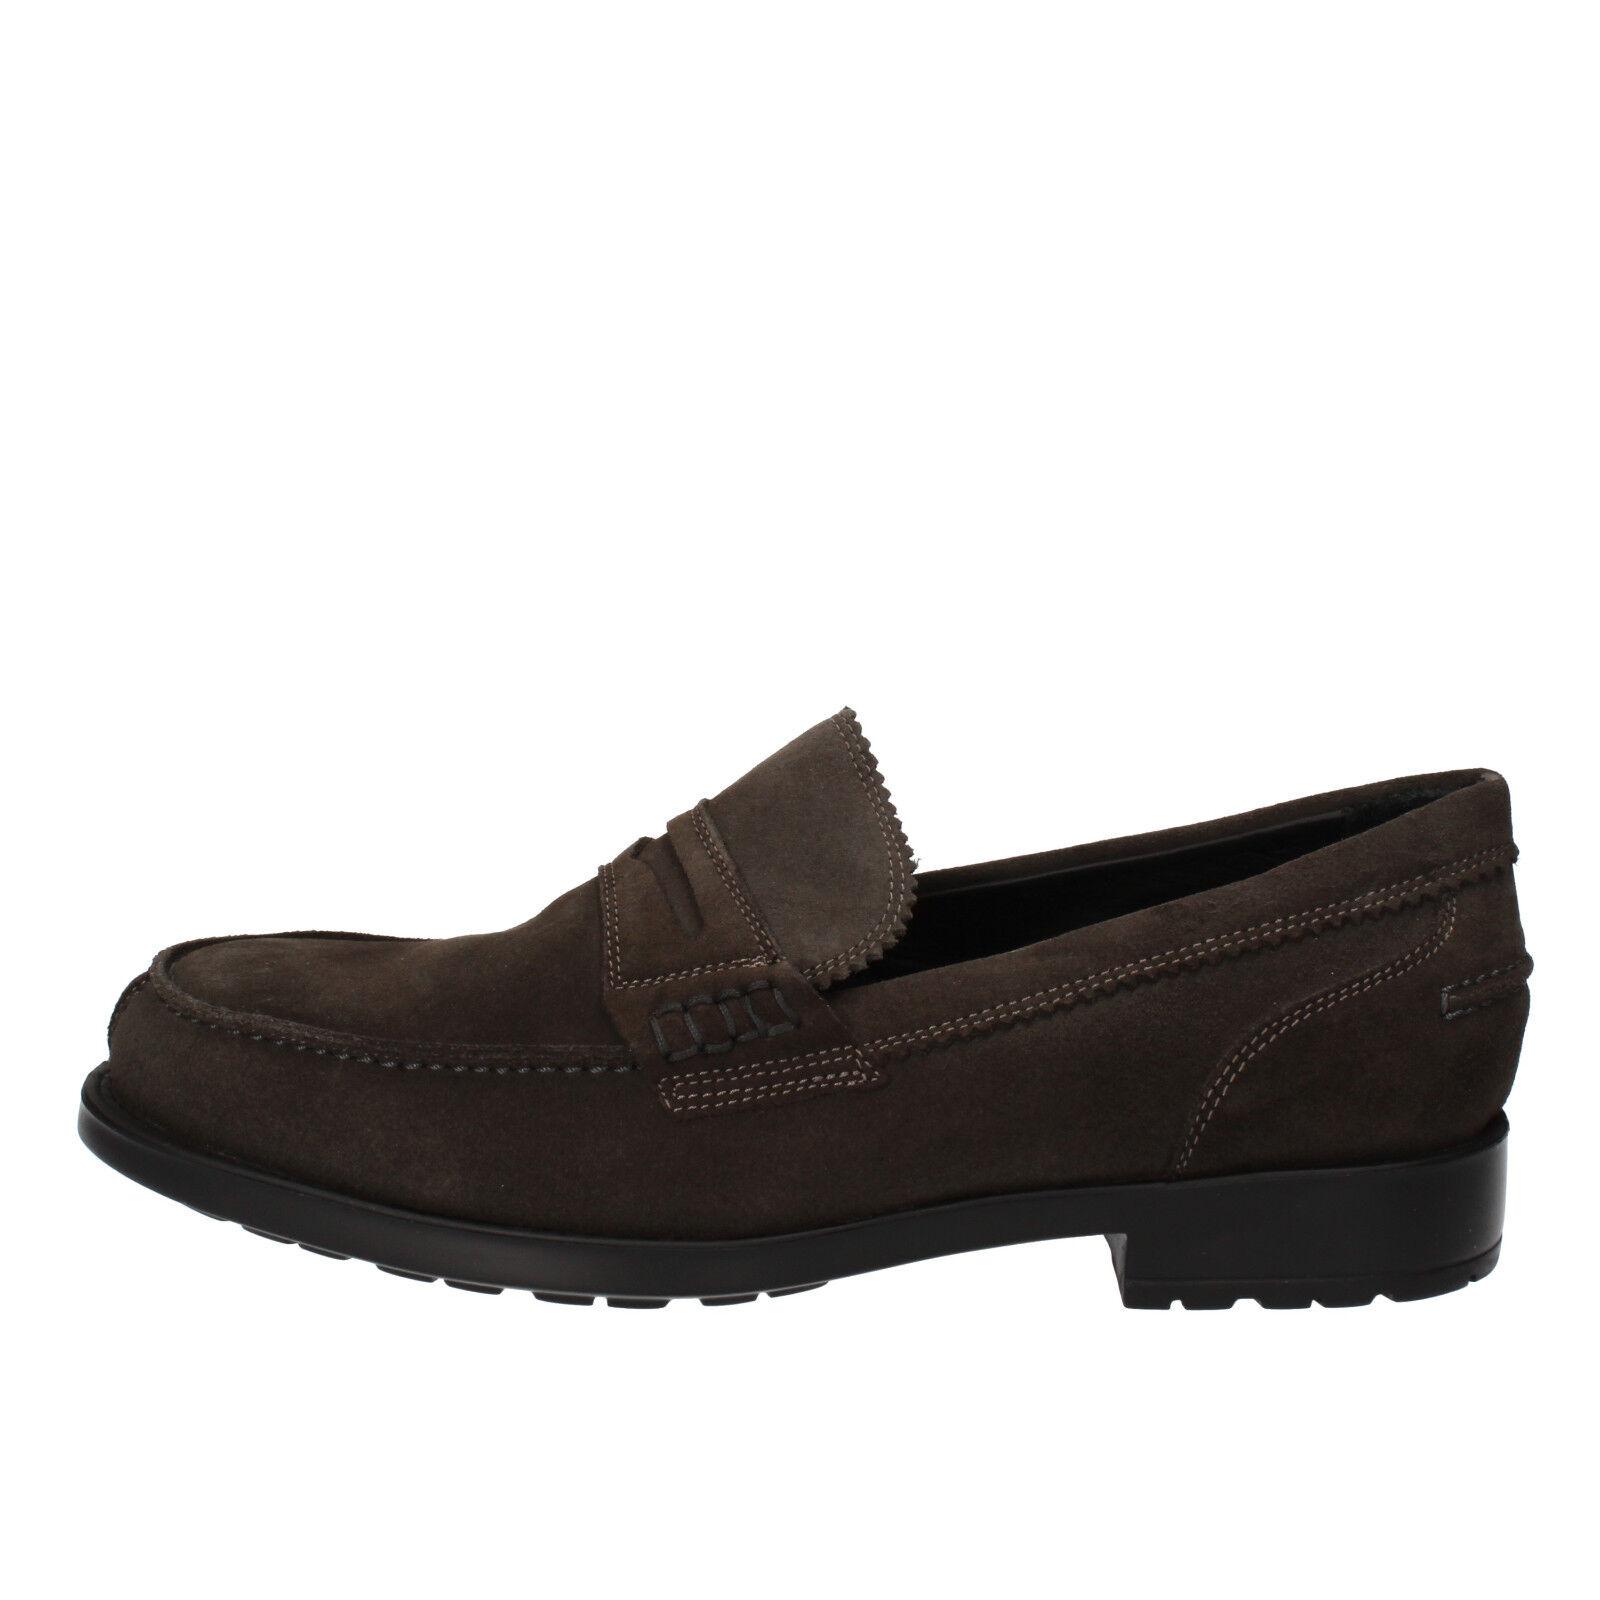 men's shoes LE VIVALDI 8 () loafers gray suede AD348-C